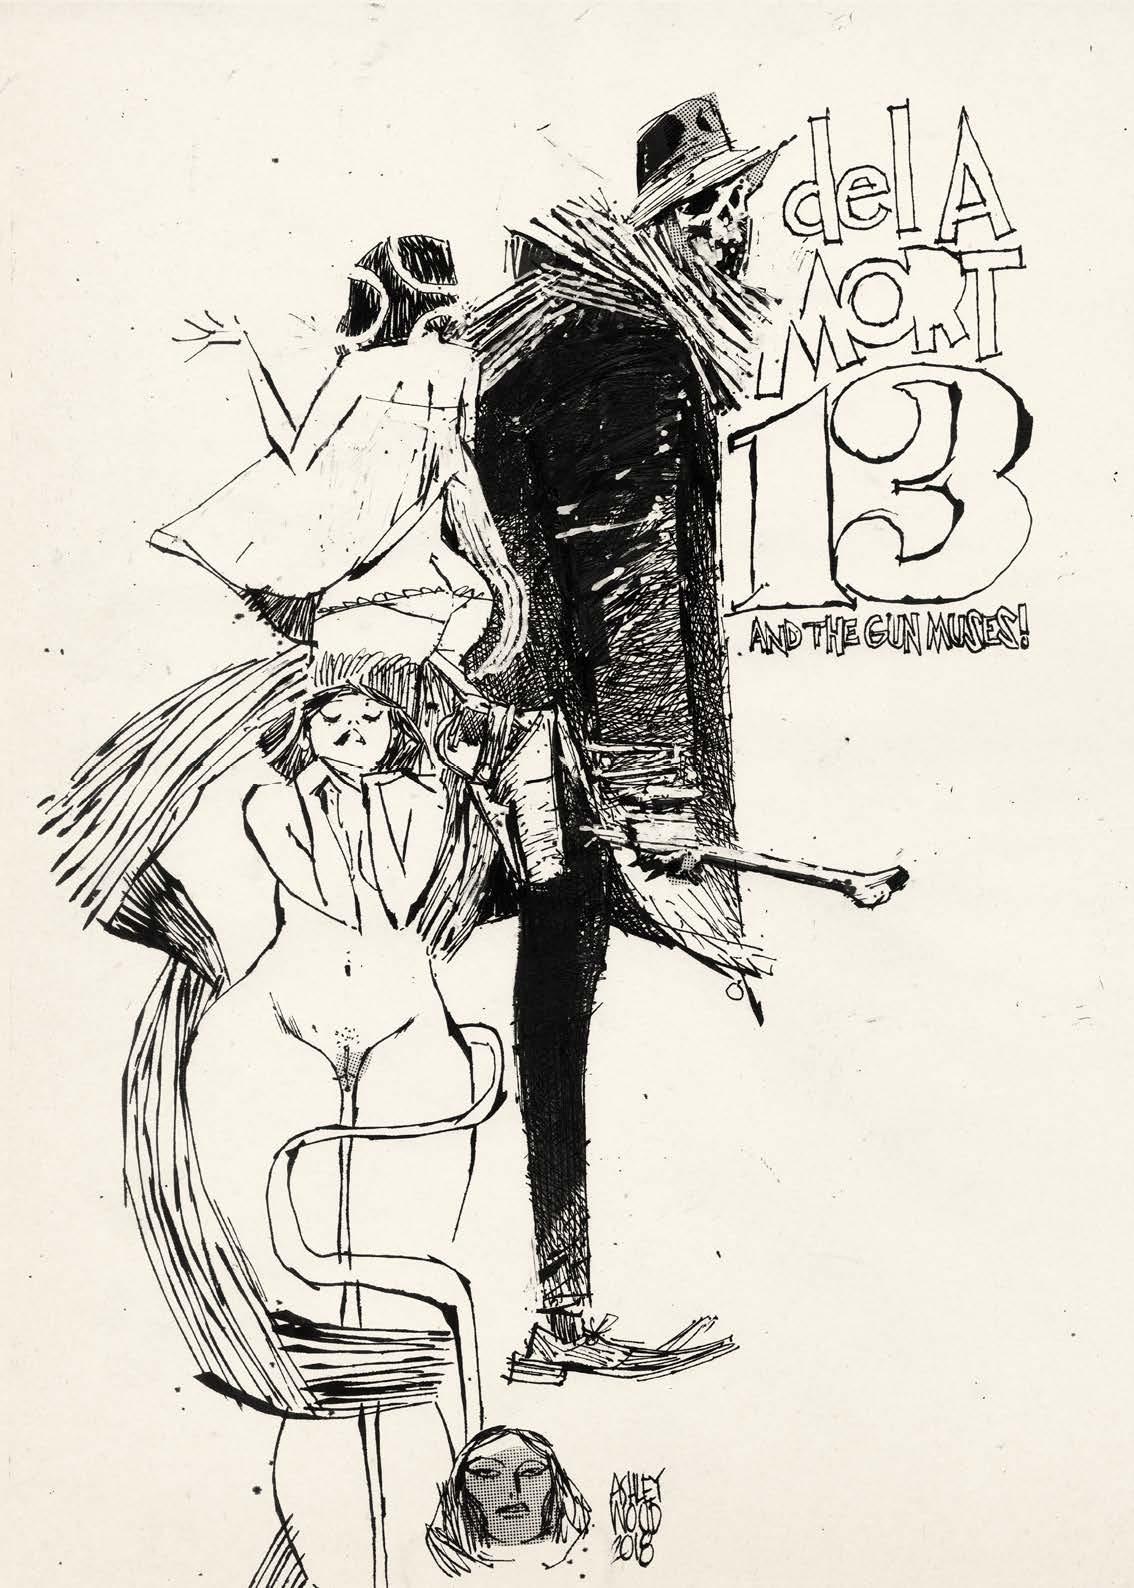 Image de l'artbook Ashley Wood - AWD XL BLACK. Muses de la mort.